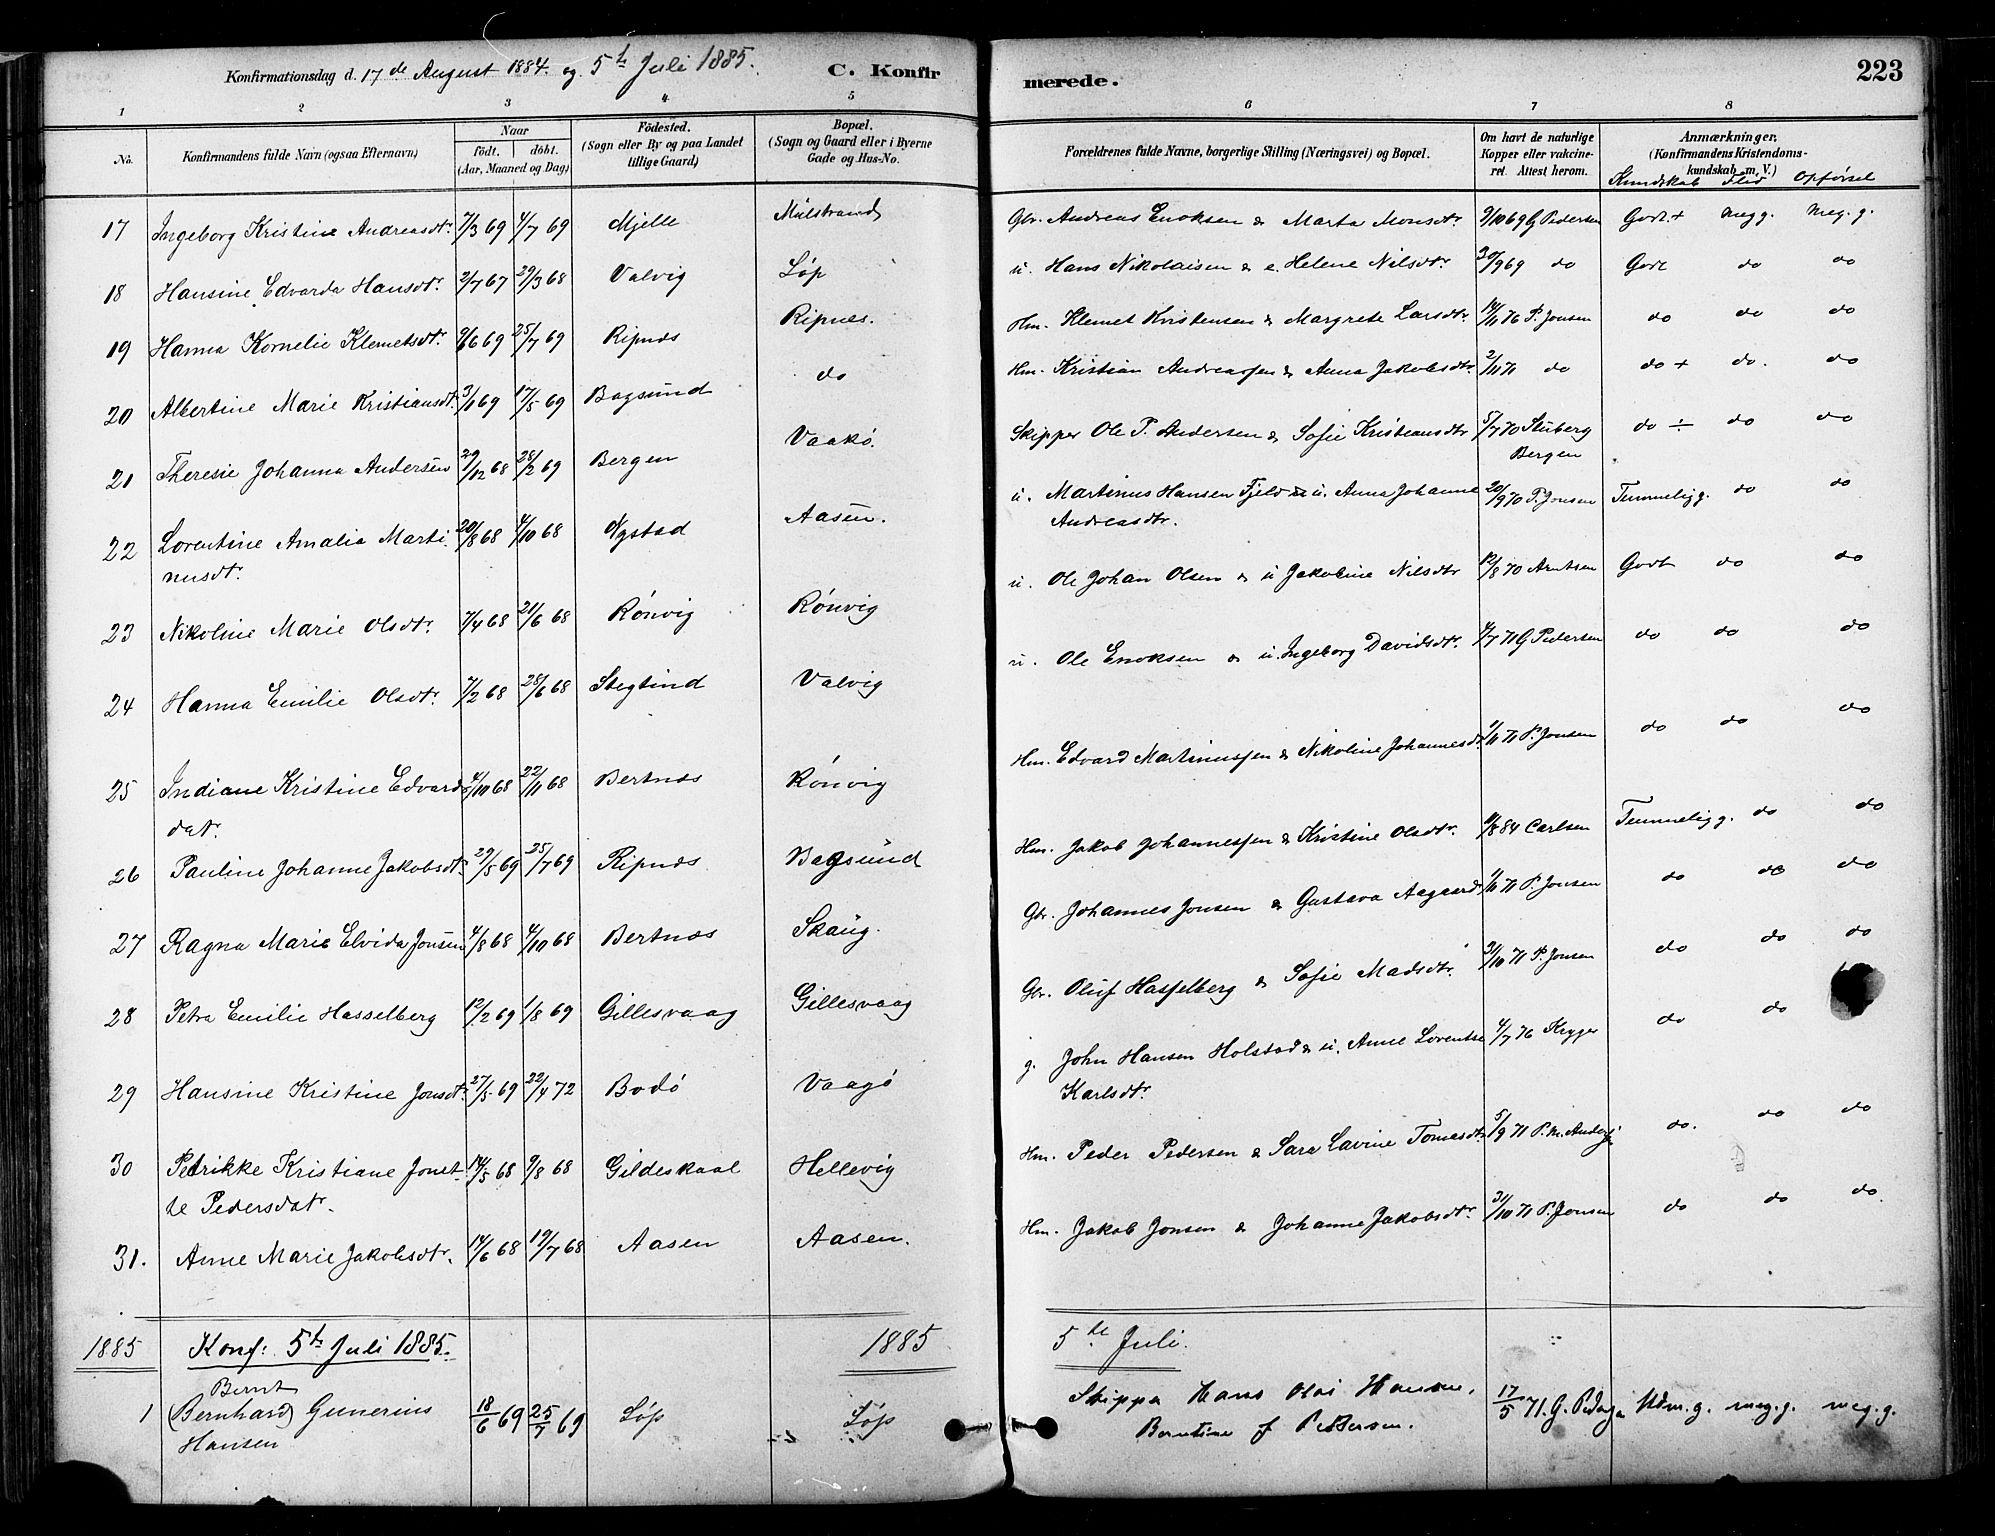 SAT, Ministerialprotokoller, klokkerbøker og fødselsregistre - Nordland, 802/L0054: Ministerialbok nr. 802A01, 1879-1893, s. 223